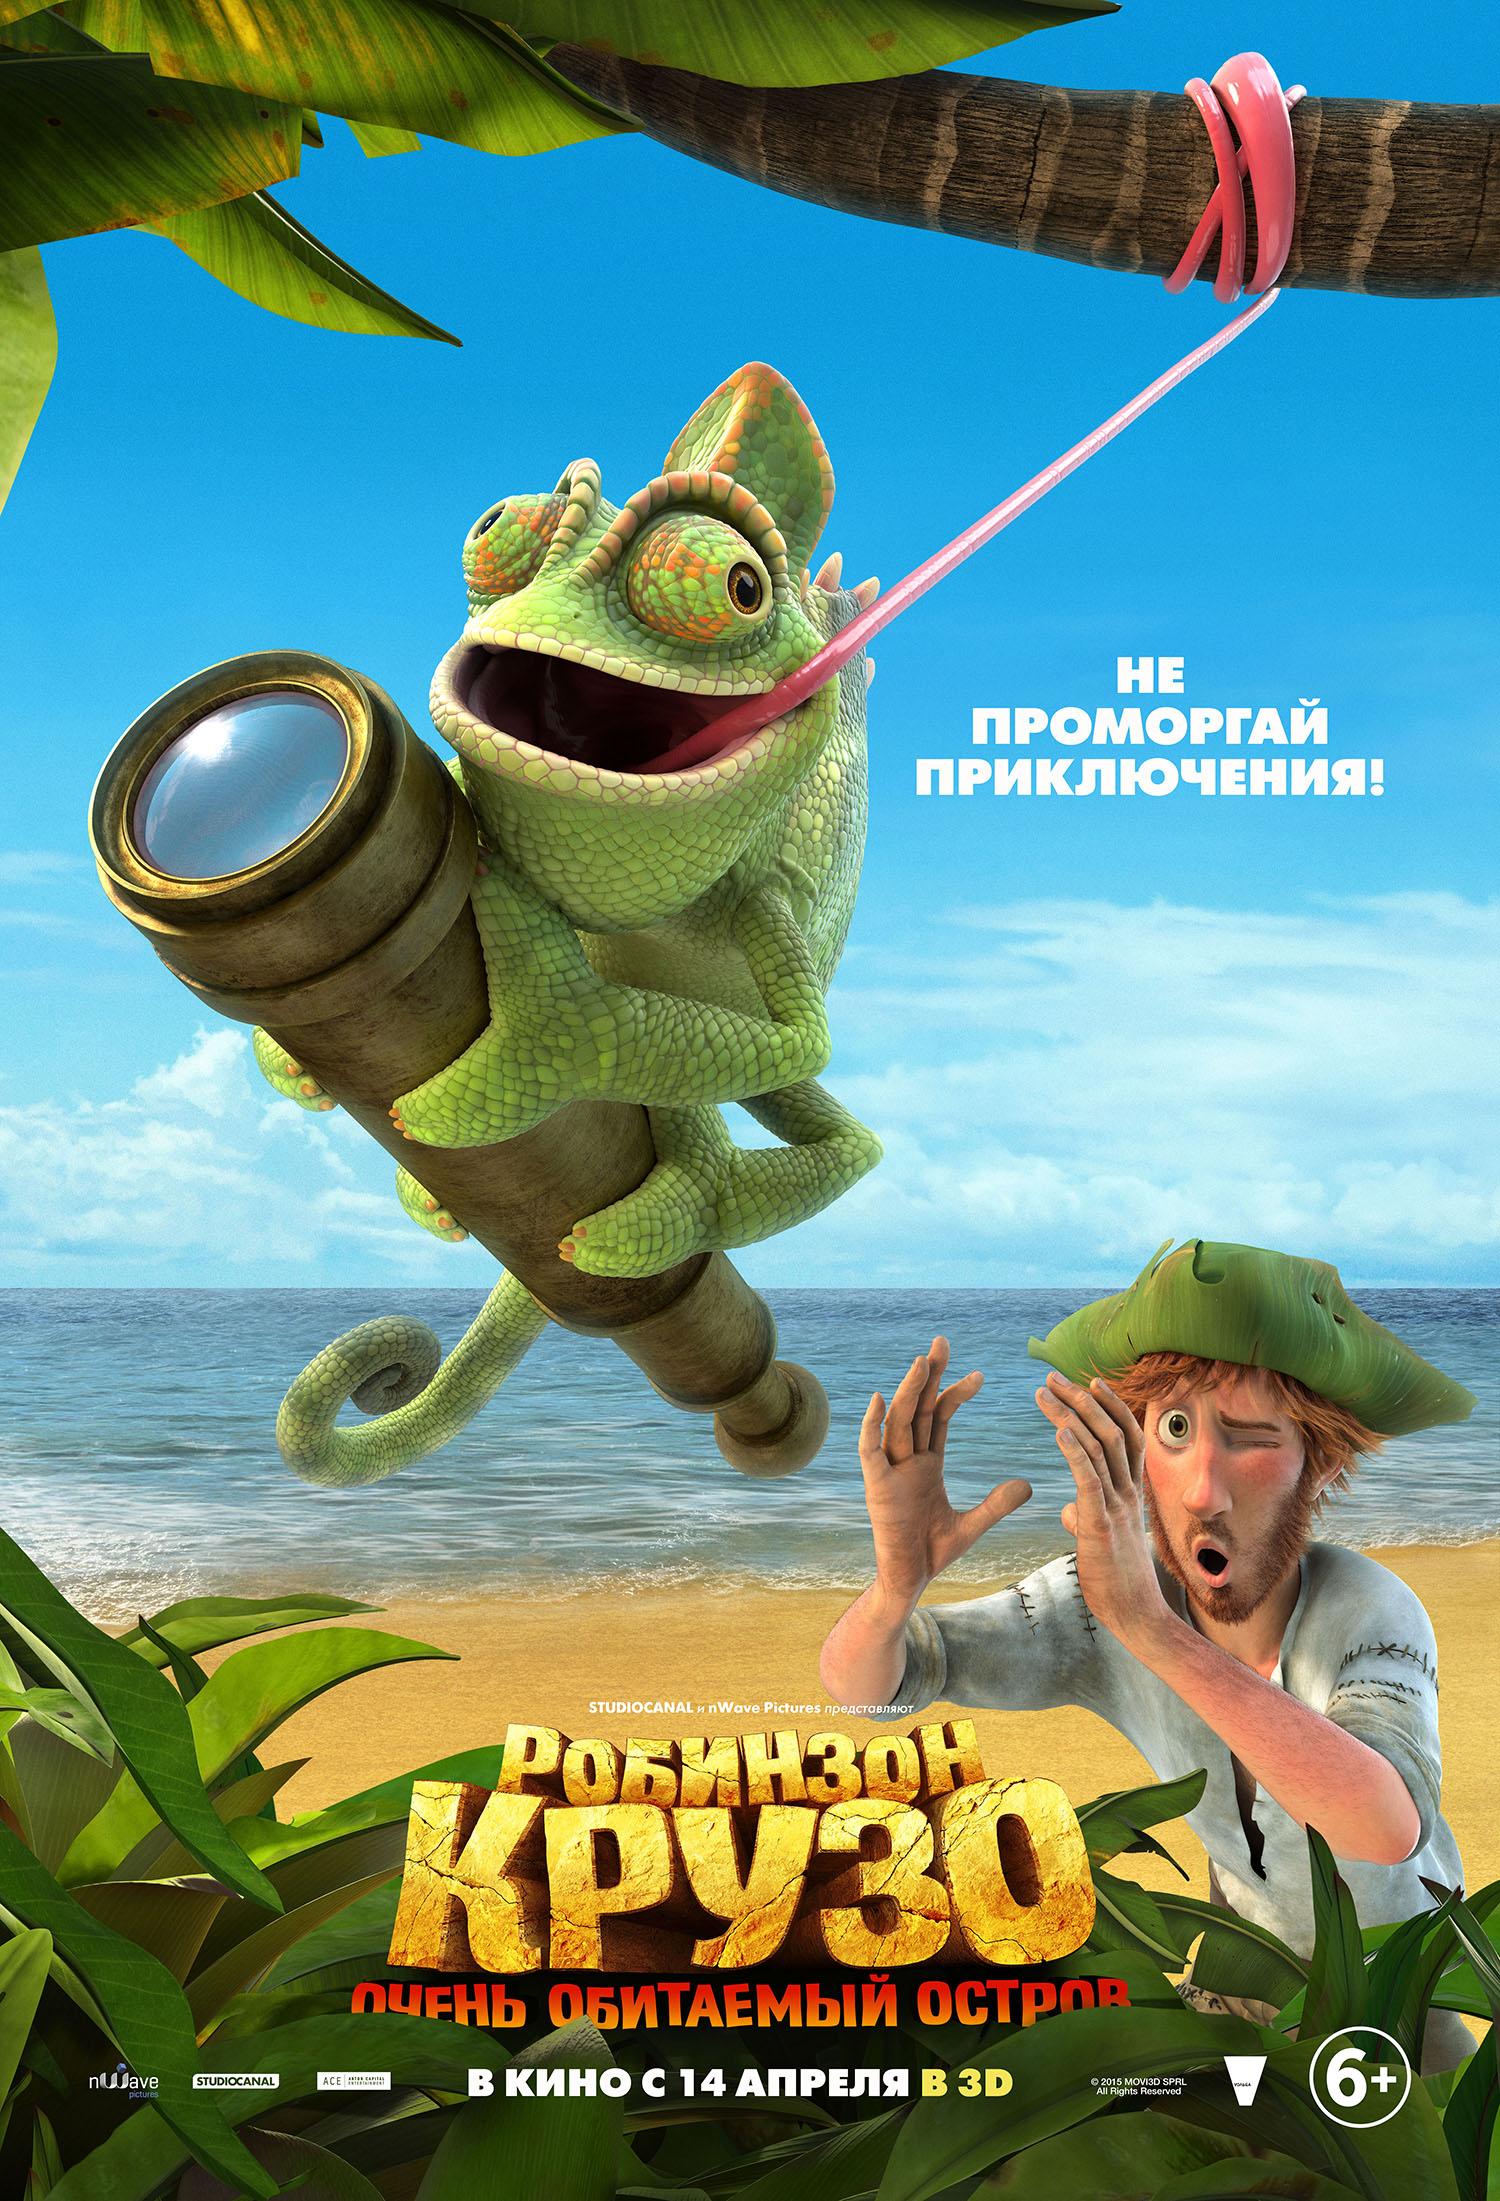 Robinson Crusoe / Робинзон Крузo (2016 Бг суб)